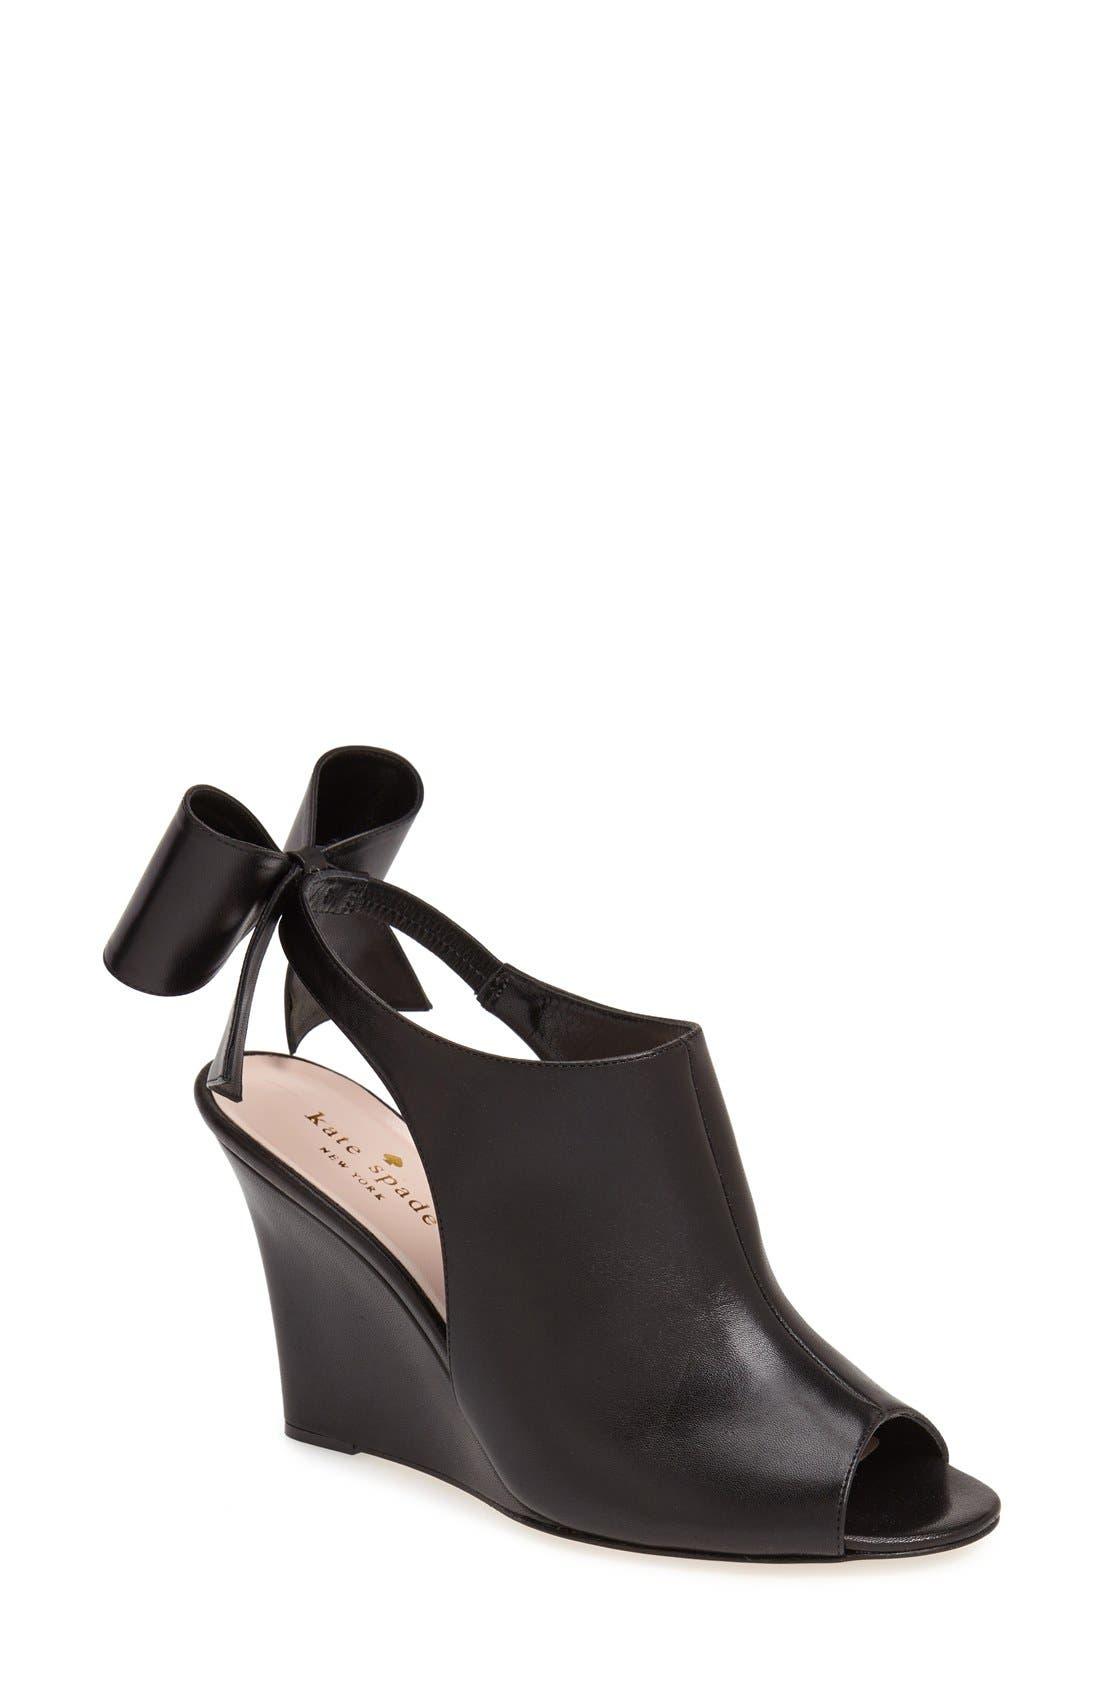 Main Image - kate spade new york 'ira' slingback sandal (Women)